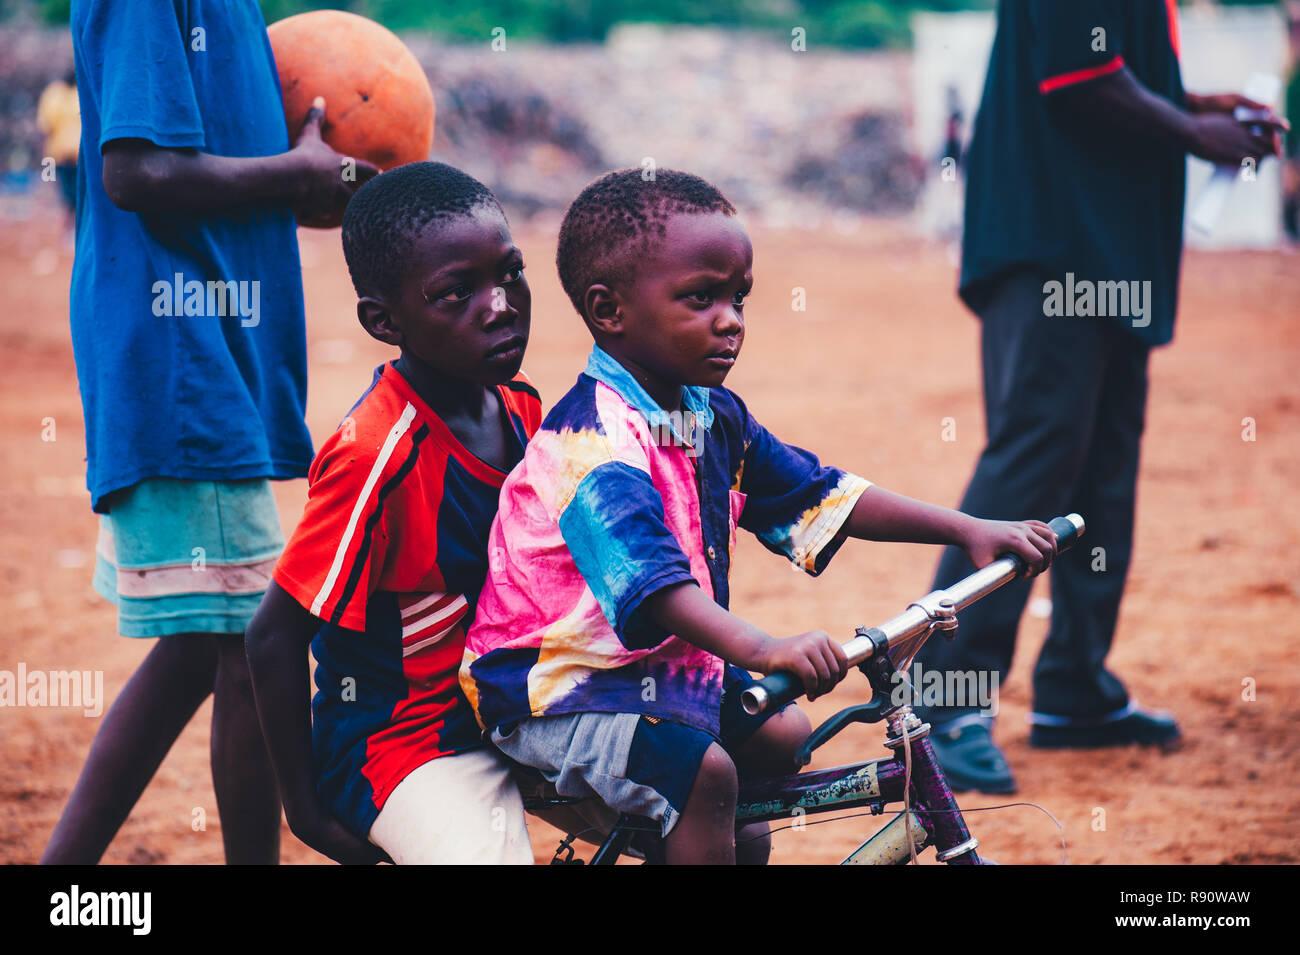 Mali Africa Black African Children Playing Soccer In A Rubbish Dump Rural Area Near Bamako Stock Photo Alamy